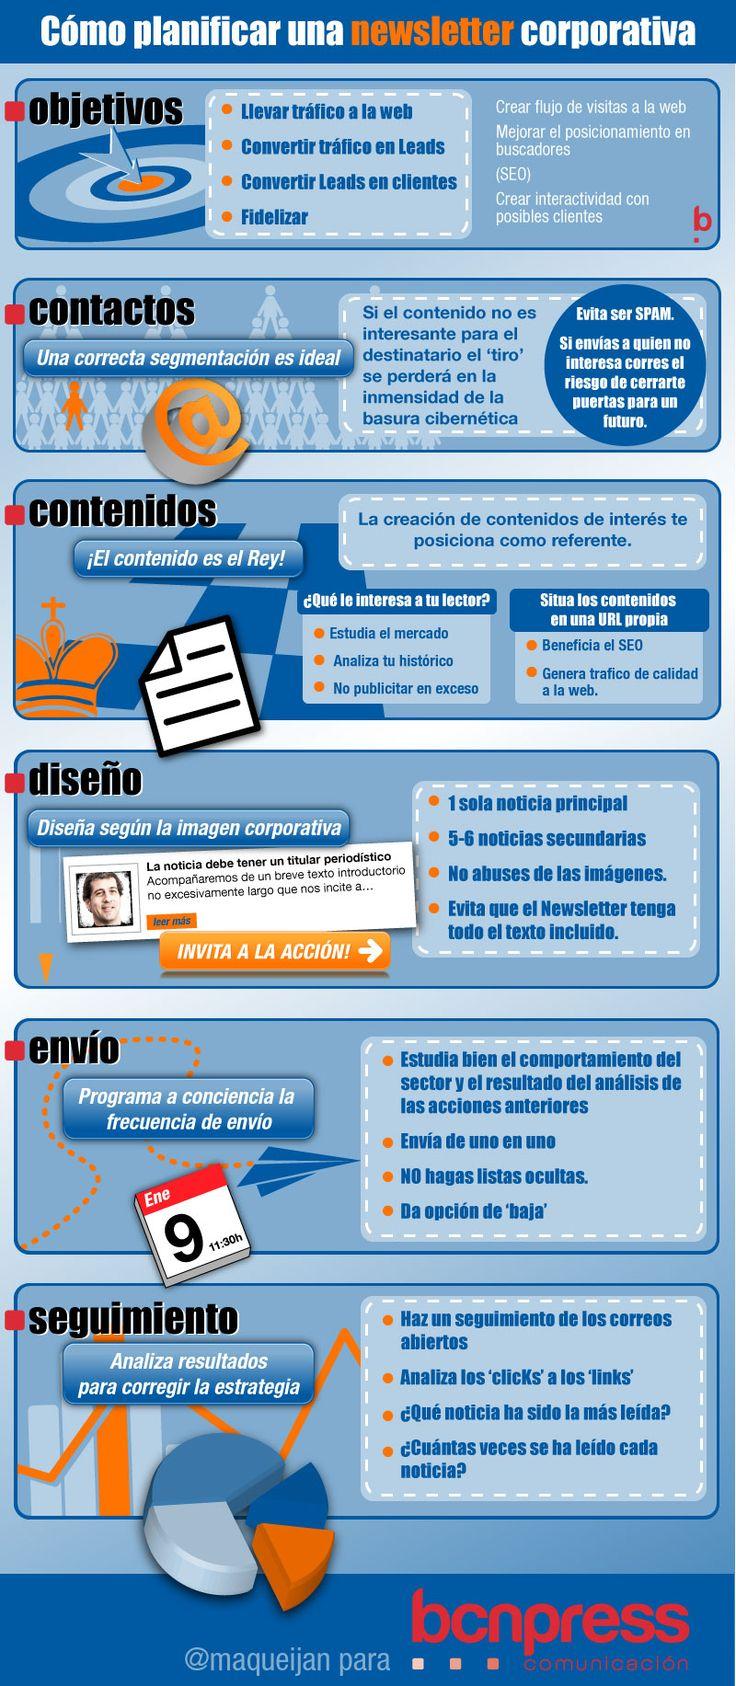 Cómo planificar una newsletter corporativa #infografia